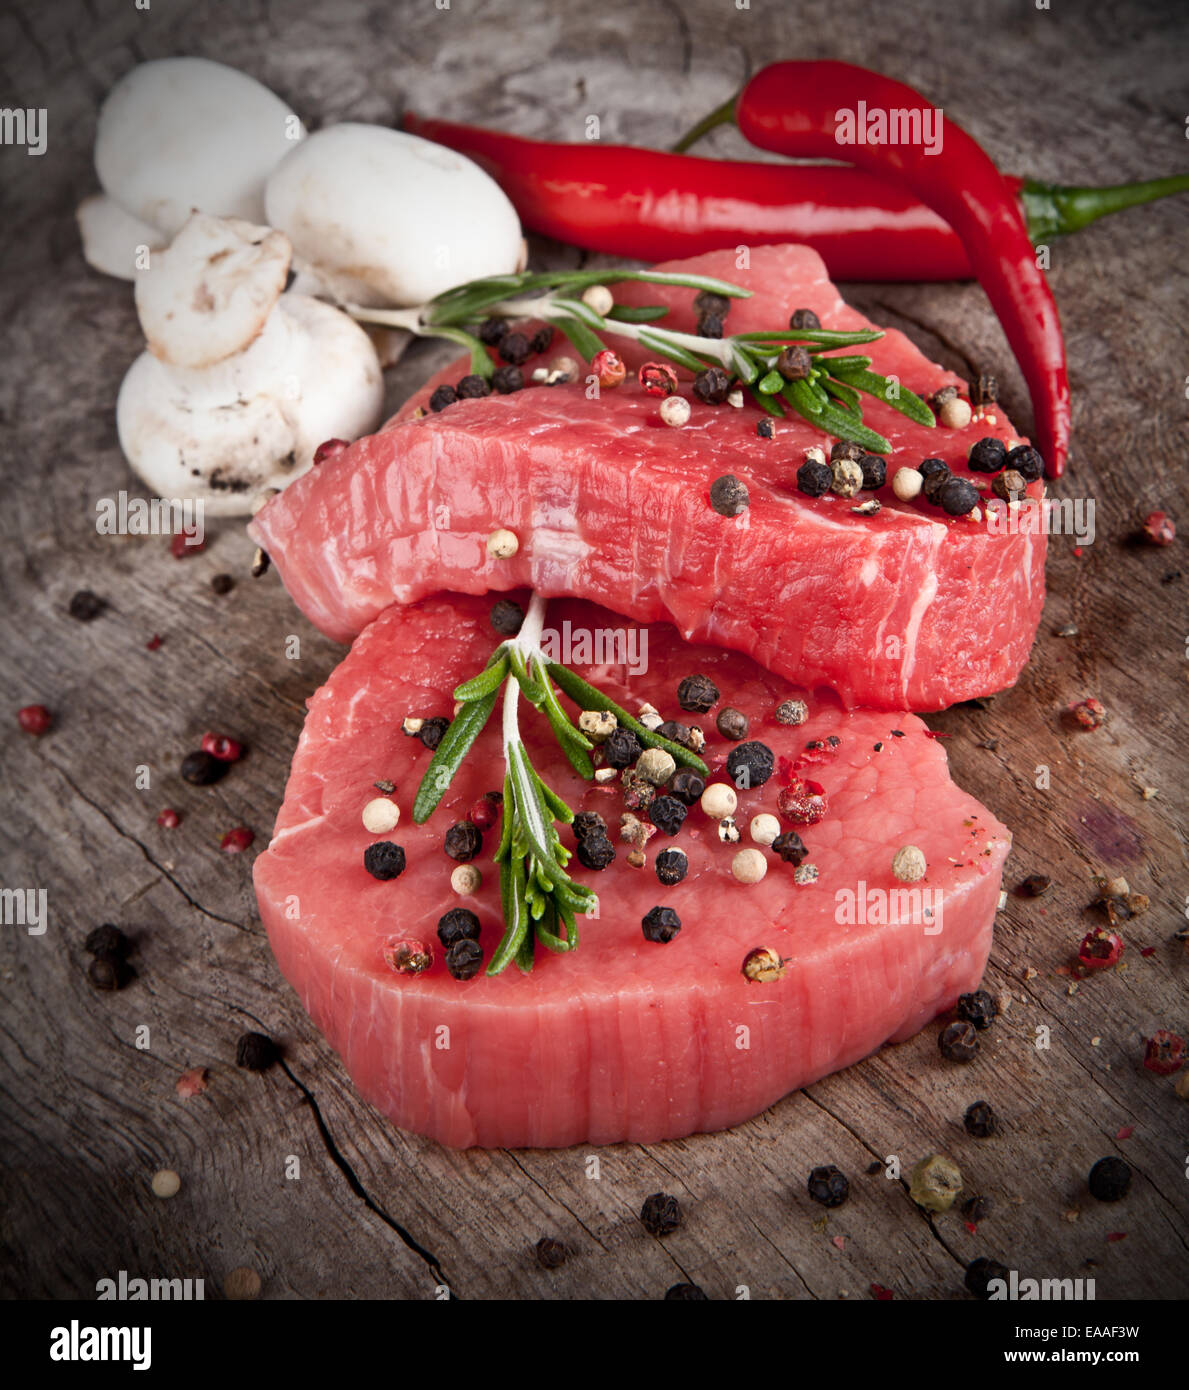 Carne di manzo crudo bistecche preparate per grill Immagini Stock